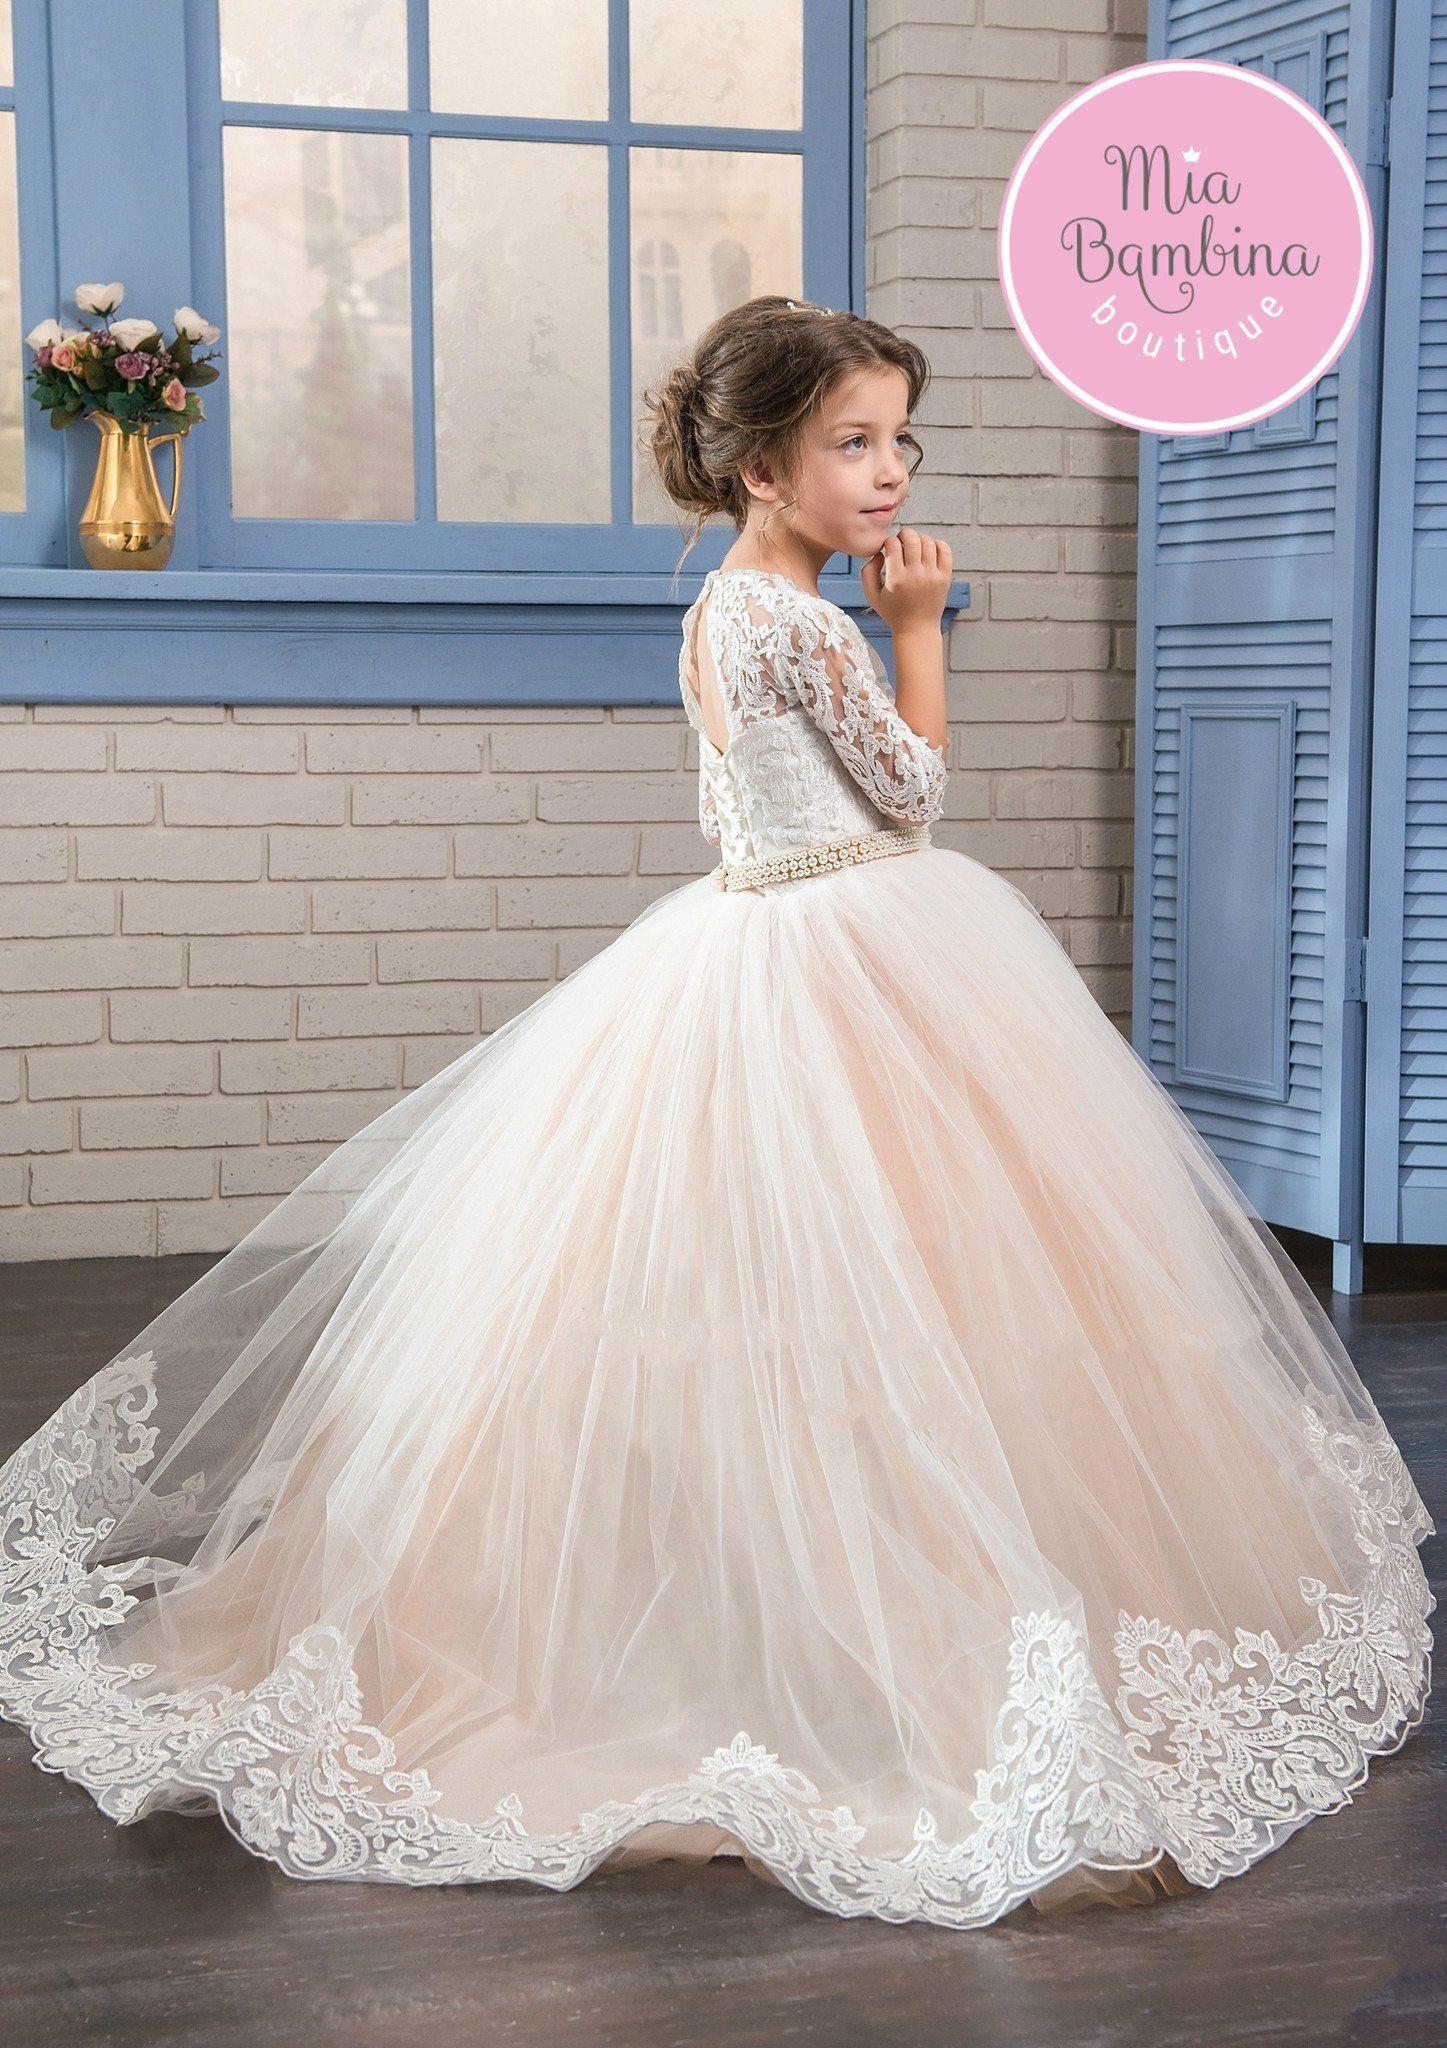 Fremont kiddus clothe pinterest dresses girls dresses and